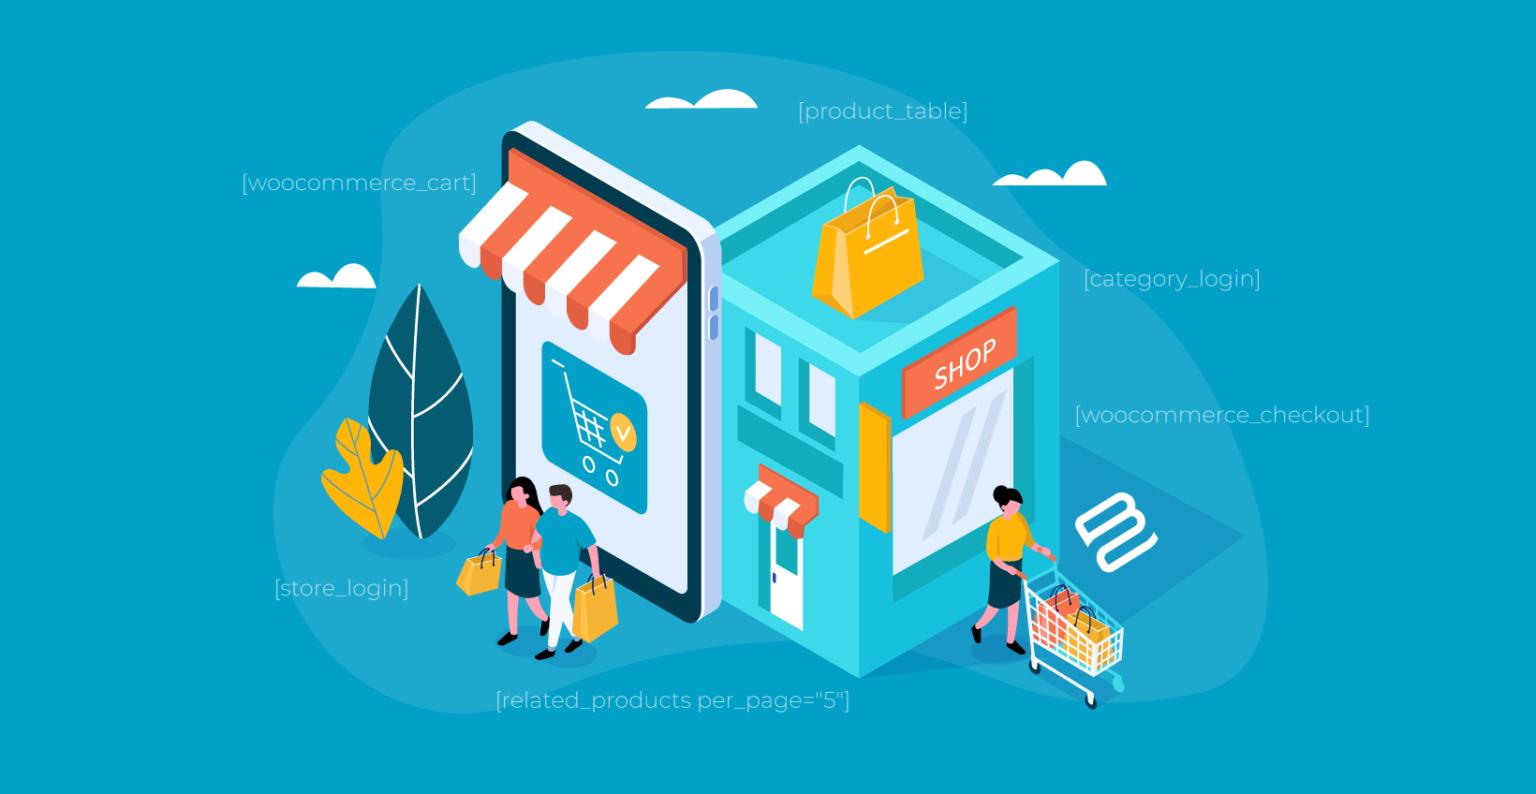 How do WooCommerce shortcodes work?